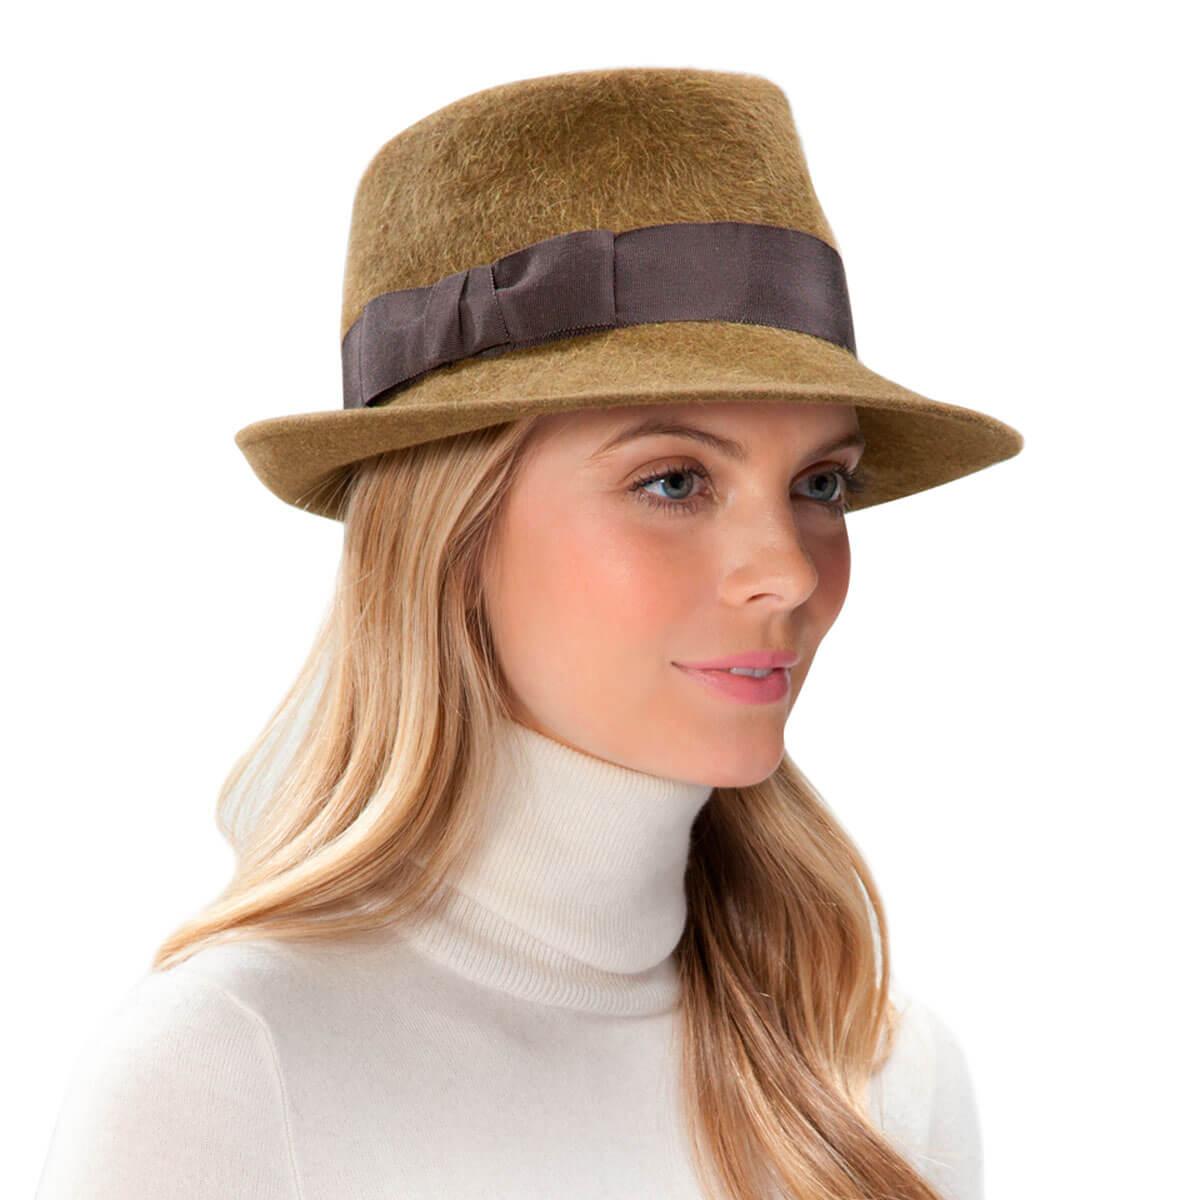 Wool Classic Eric Javits Luxury Fashion Designer Womens Headwear Hat